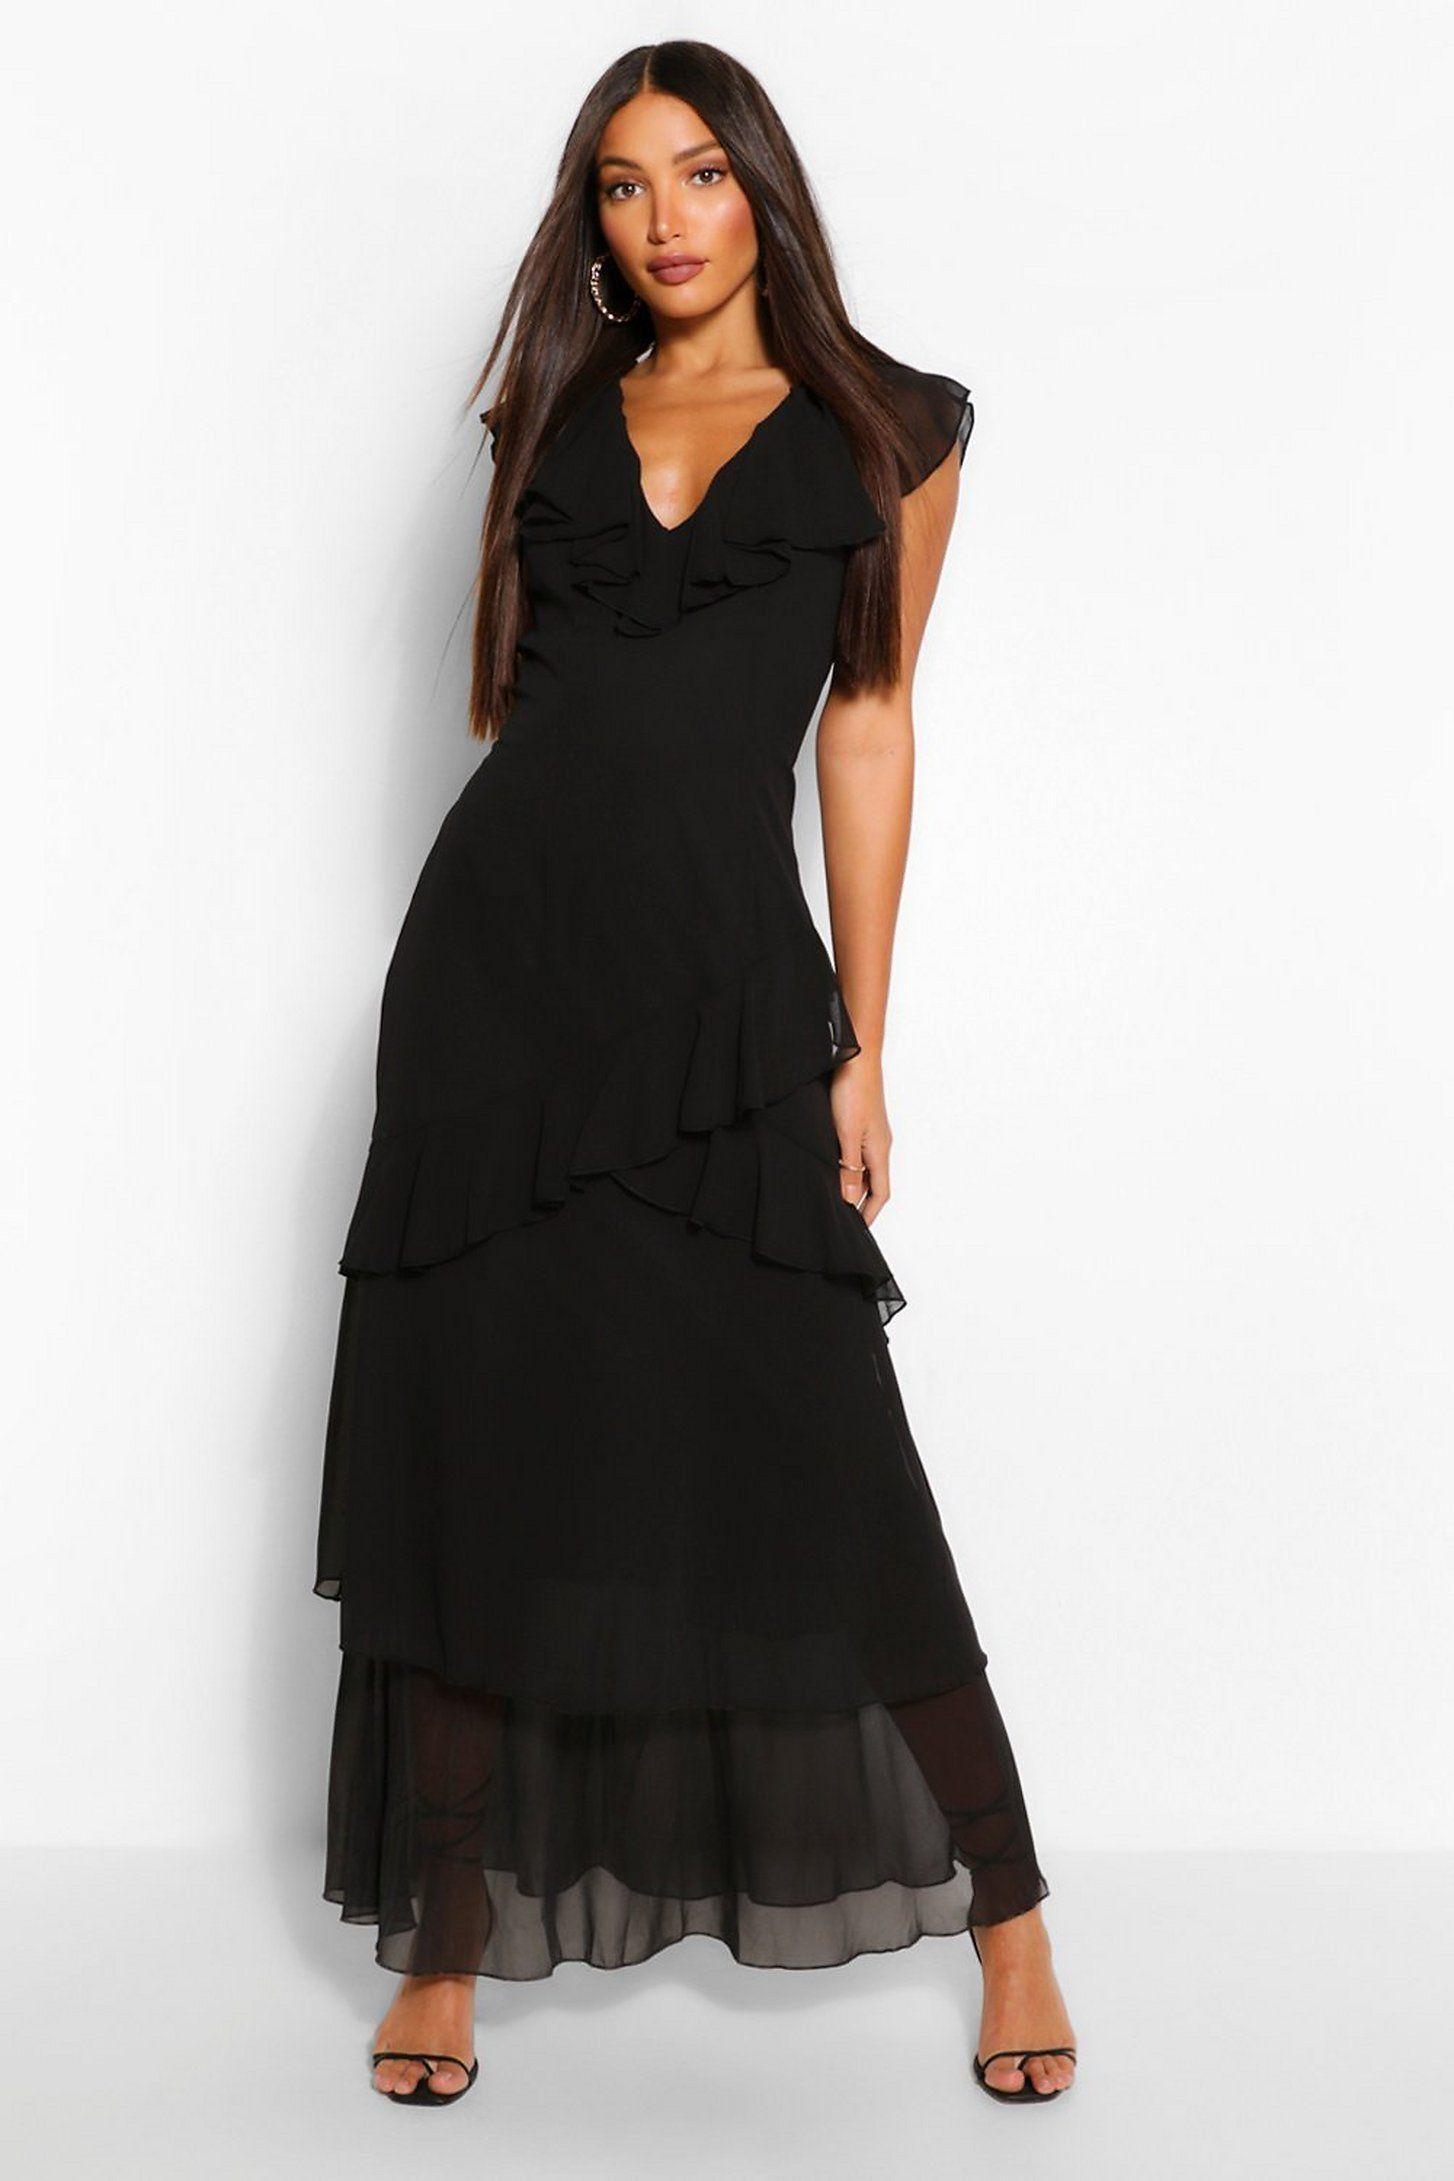 Tall Woven Plunge Ruffle Maxi Dress Boohoo Clothing For Tall Women Black Maxi Dress Maxi Dress [ 2181 x 1454 Pixel ]